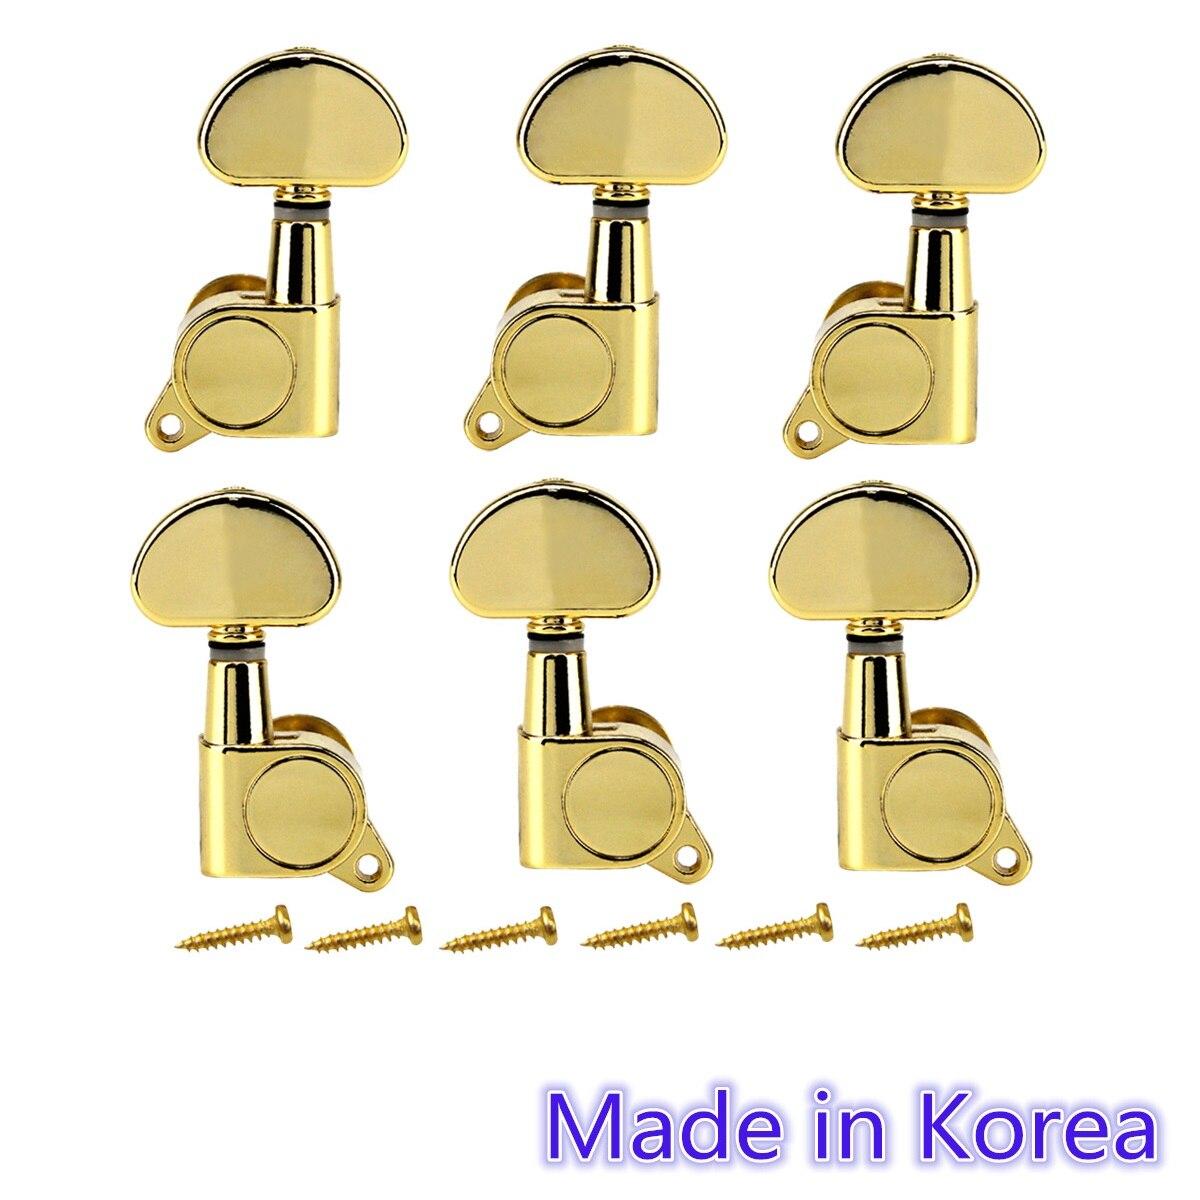 1 GOLD BASS GUITAR MACHINE HEAD ENCLOSED TUNER NEW